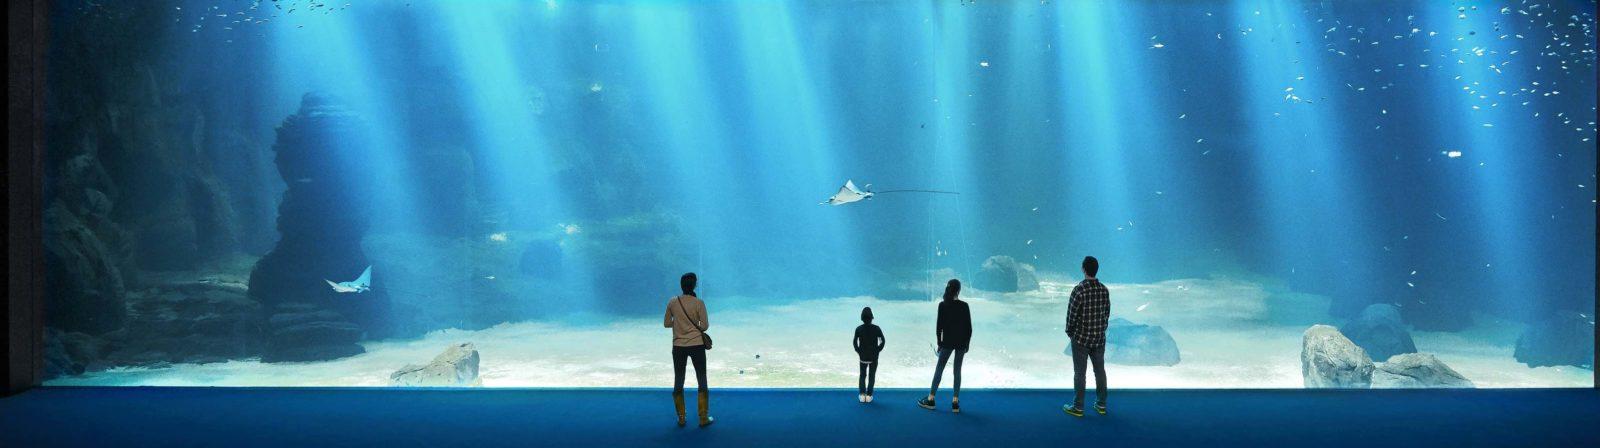 Nausicaa Boulogne-sur-Mer grande baie et personnes